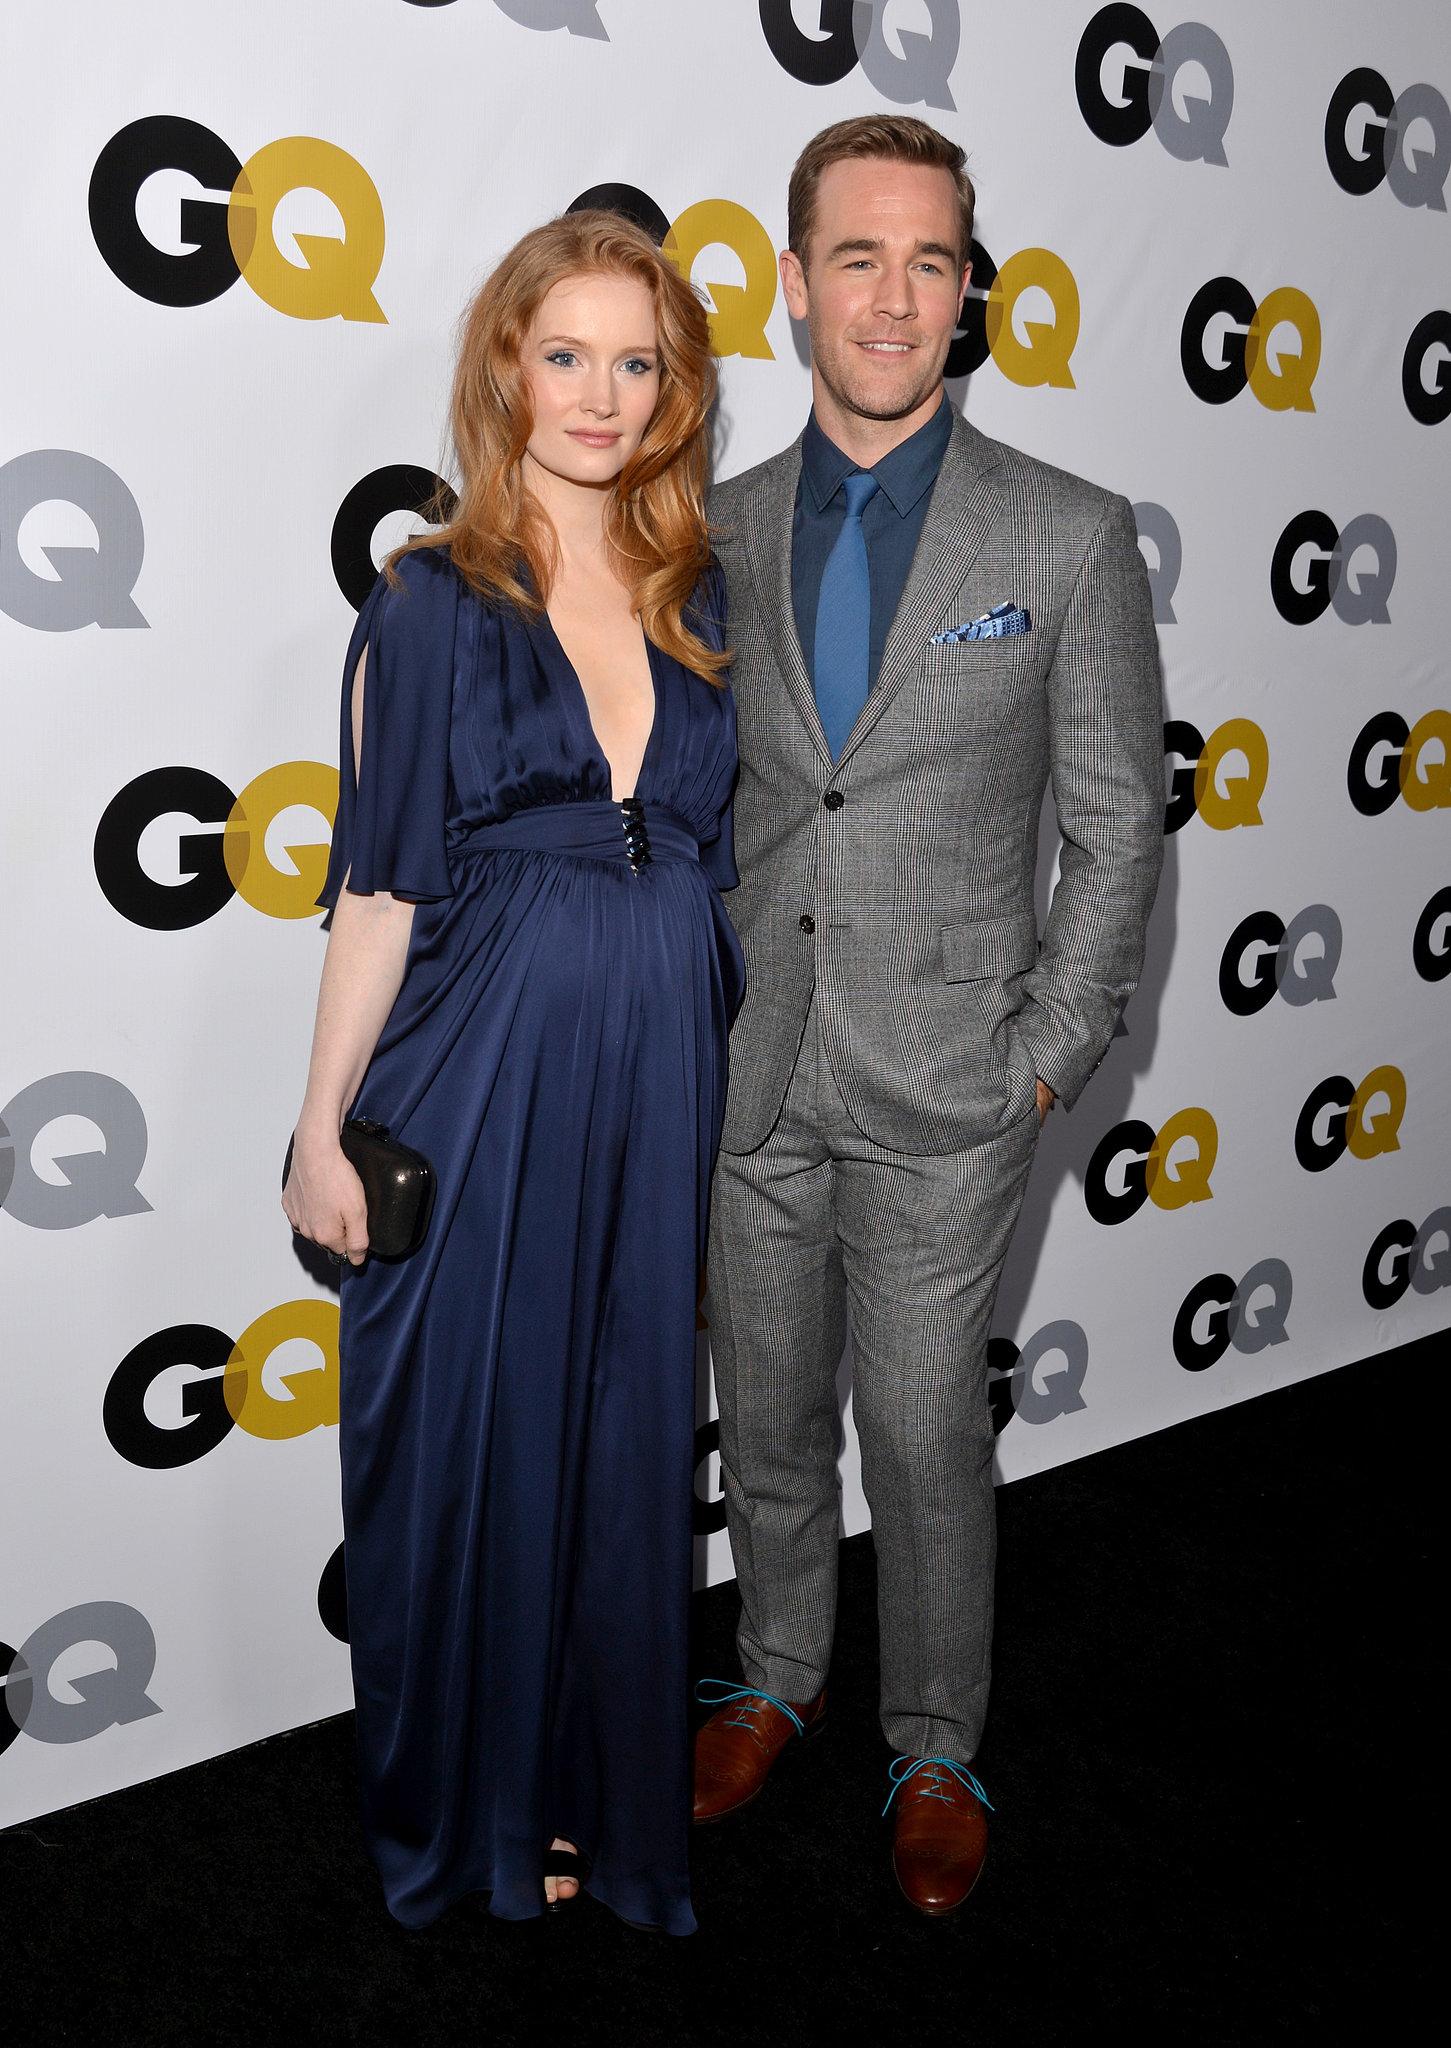 James Van Der Beek posed with his pregnant wife, Kimberly Brook.